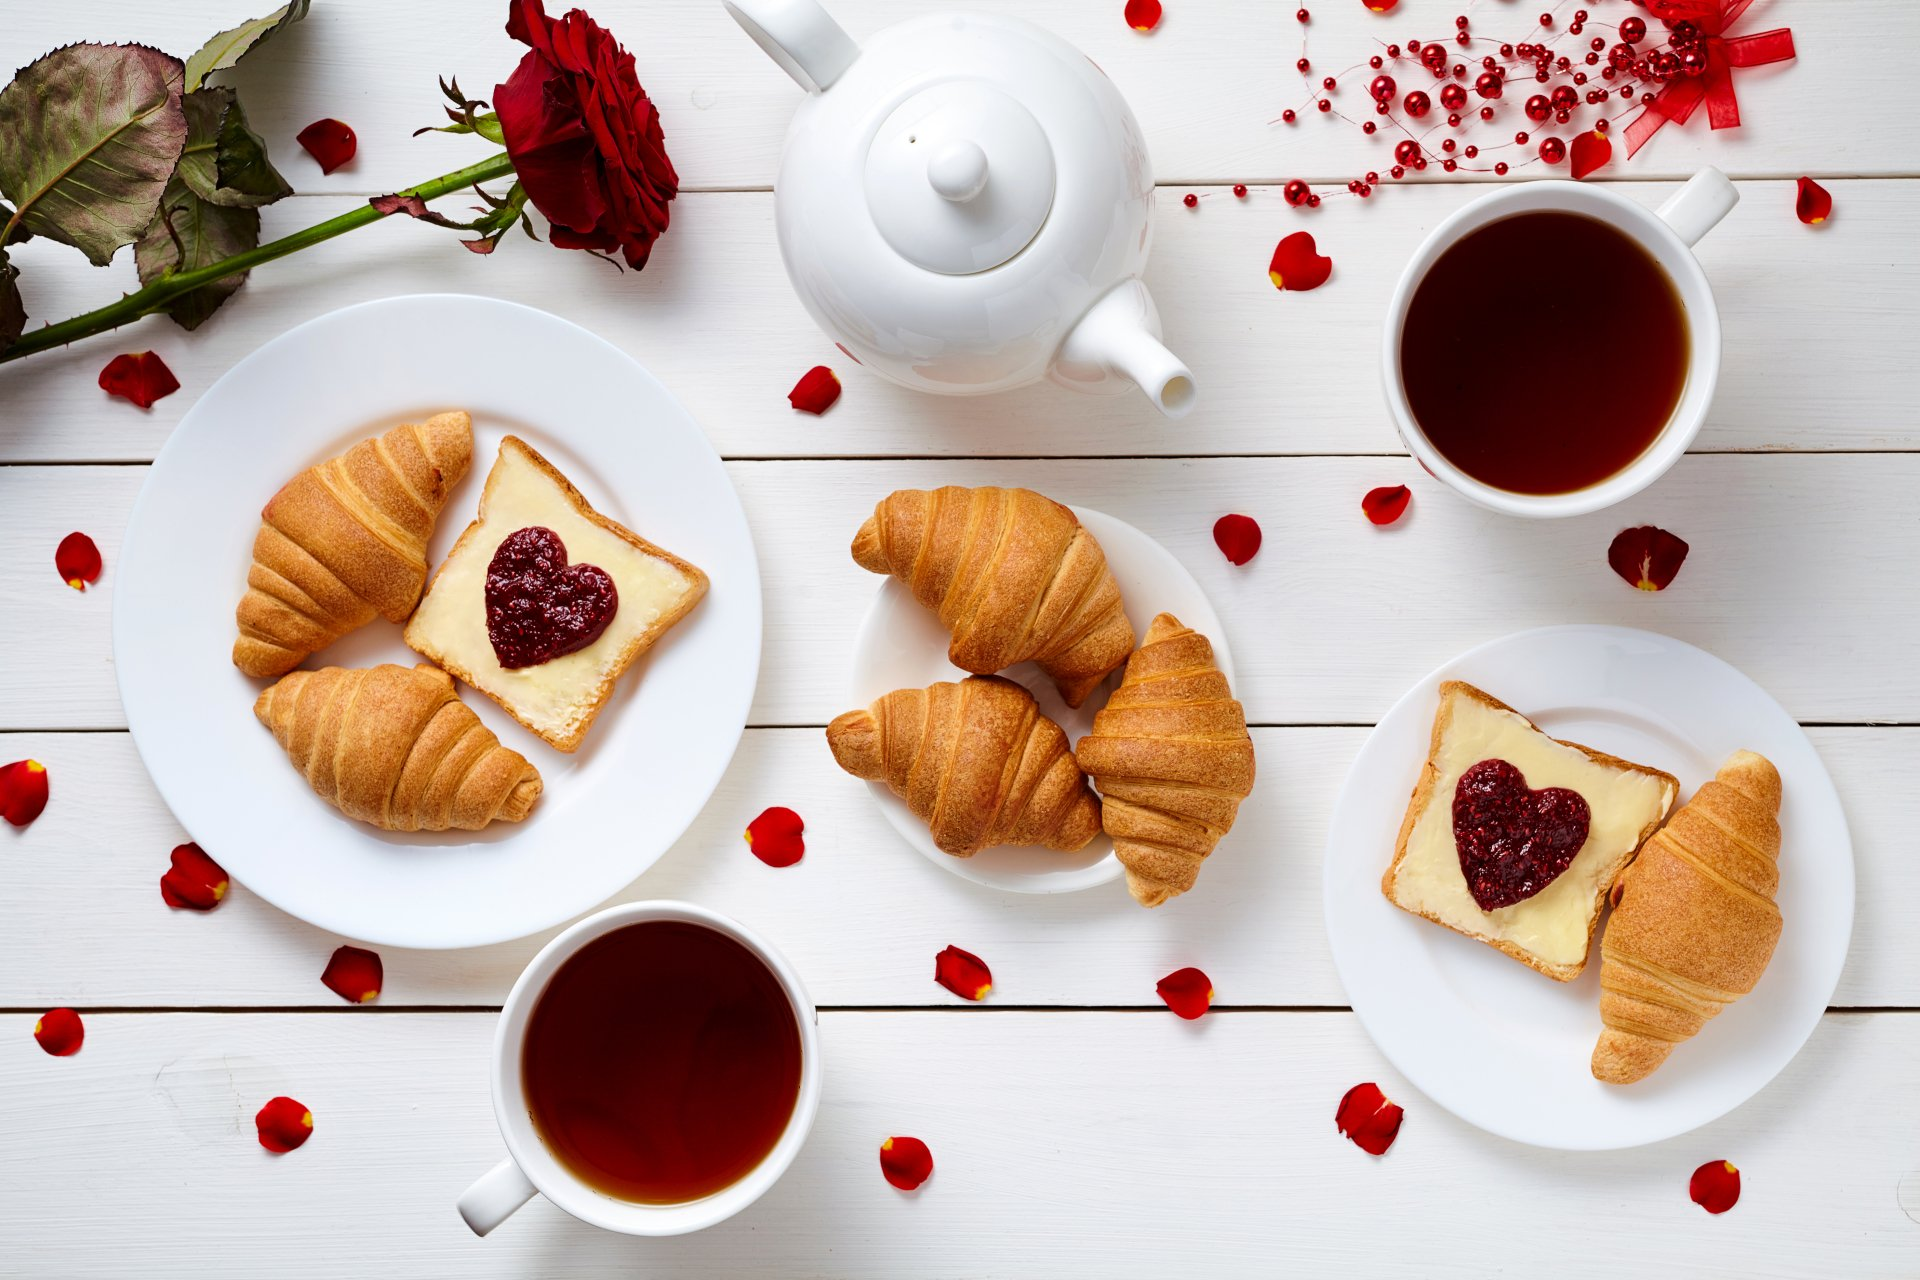 Food - Breakfast  Still Life Tea Cup Croissant Romantic Wallpaper